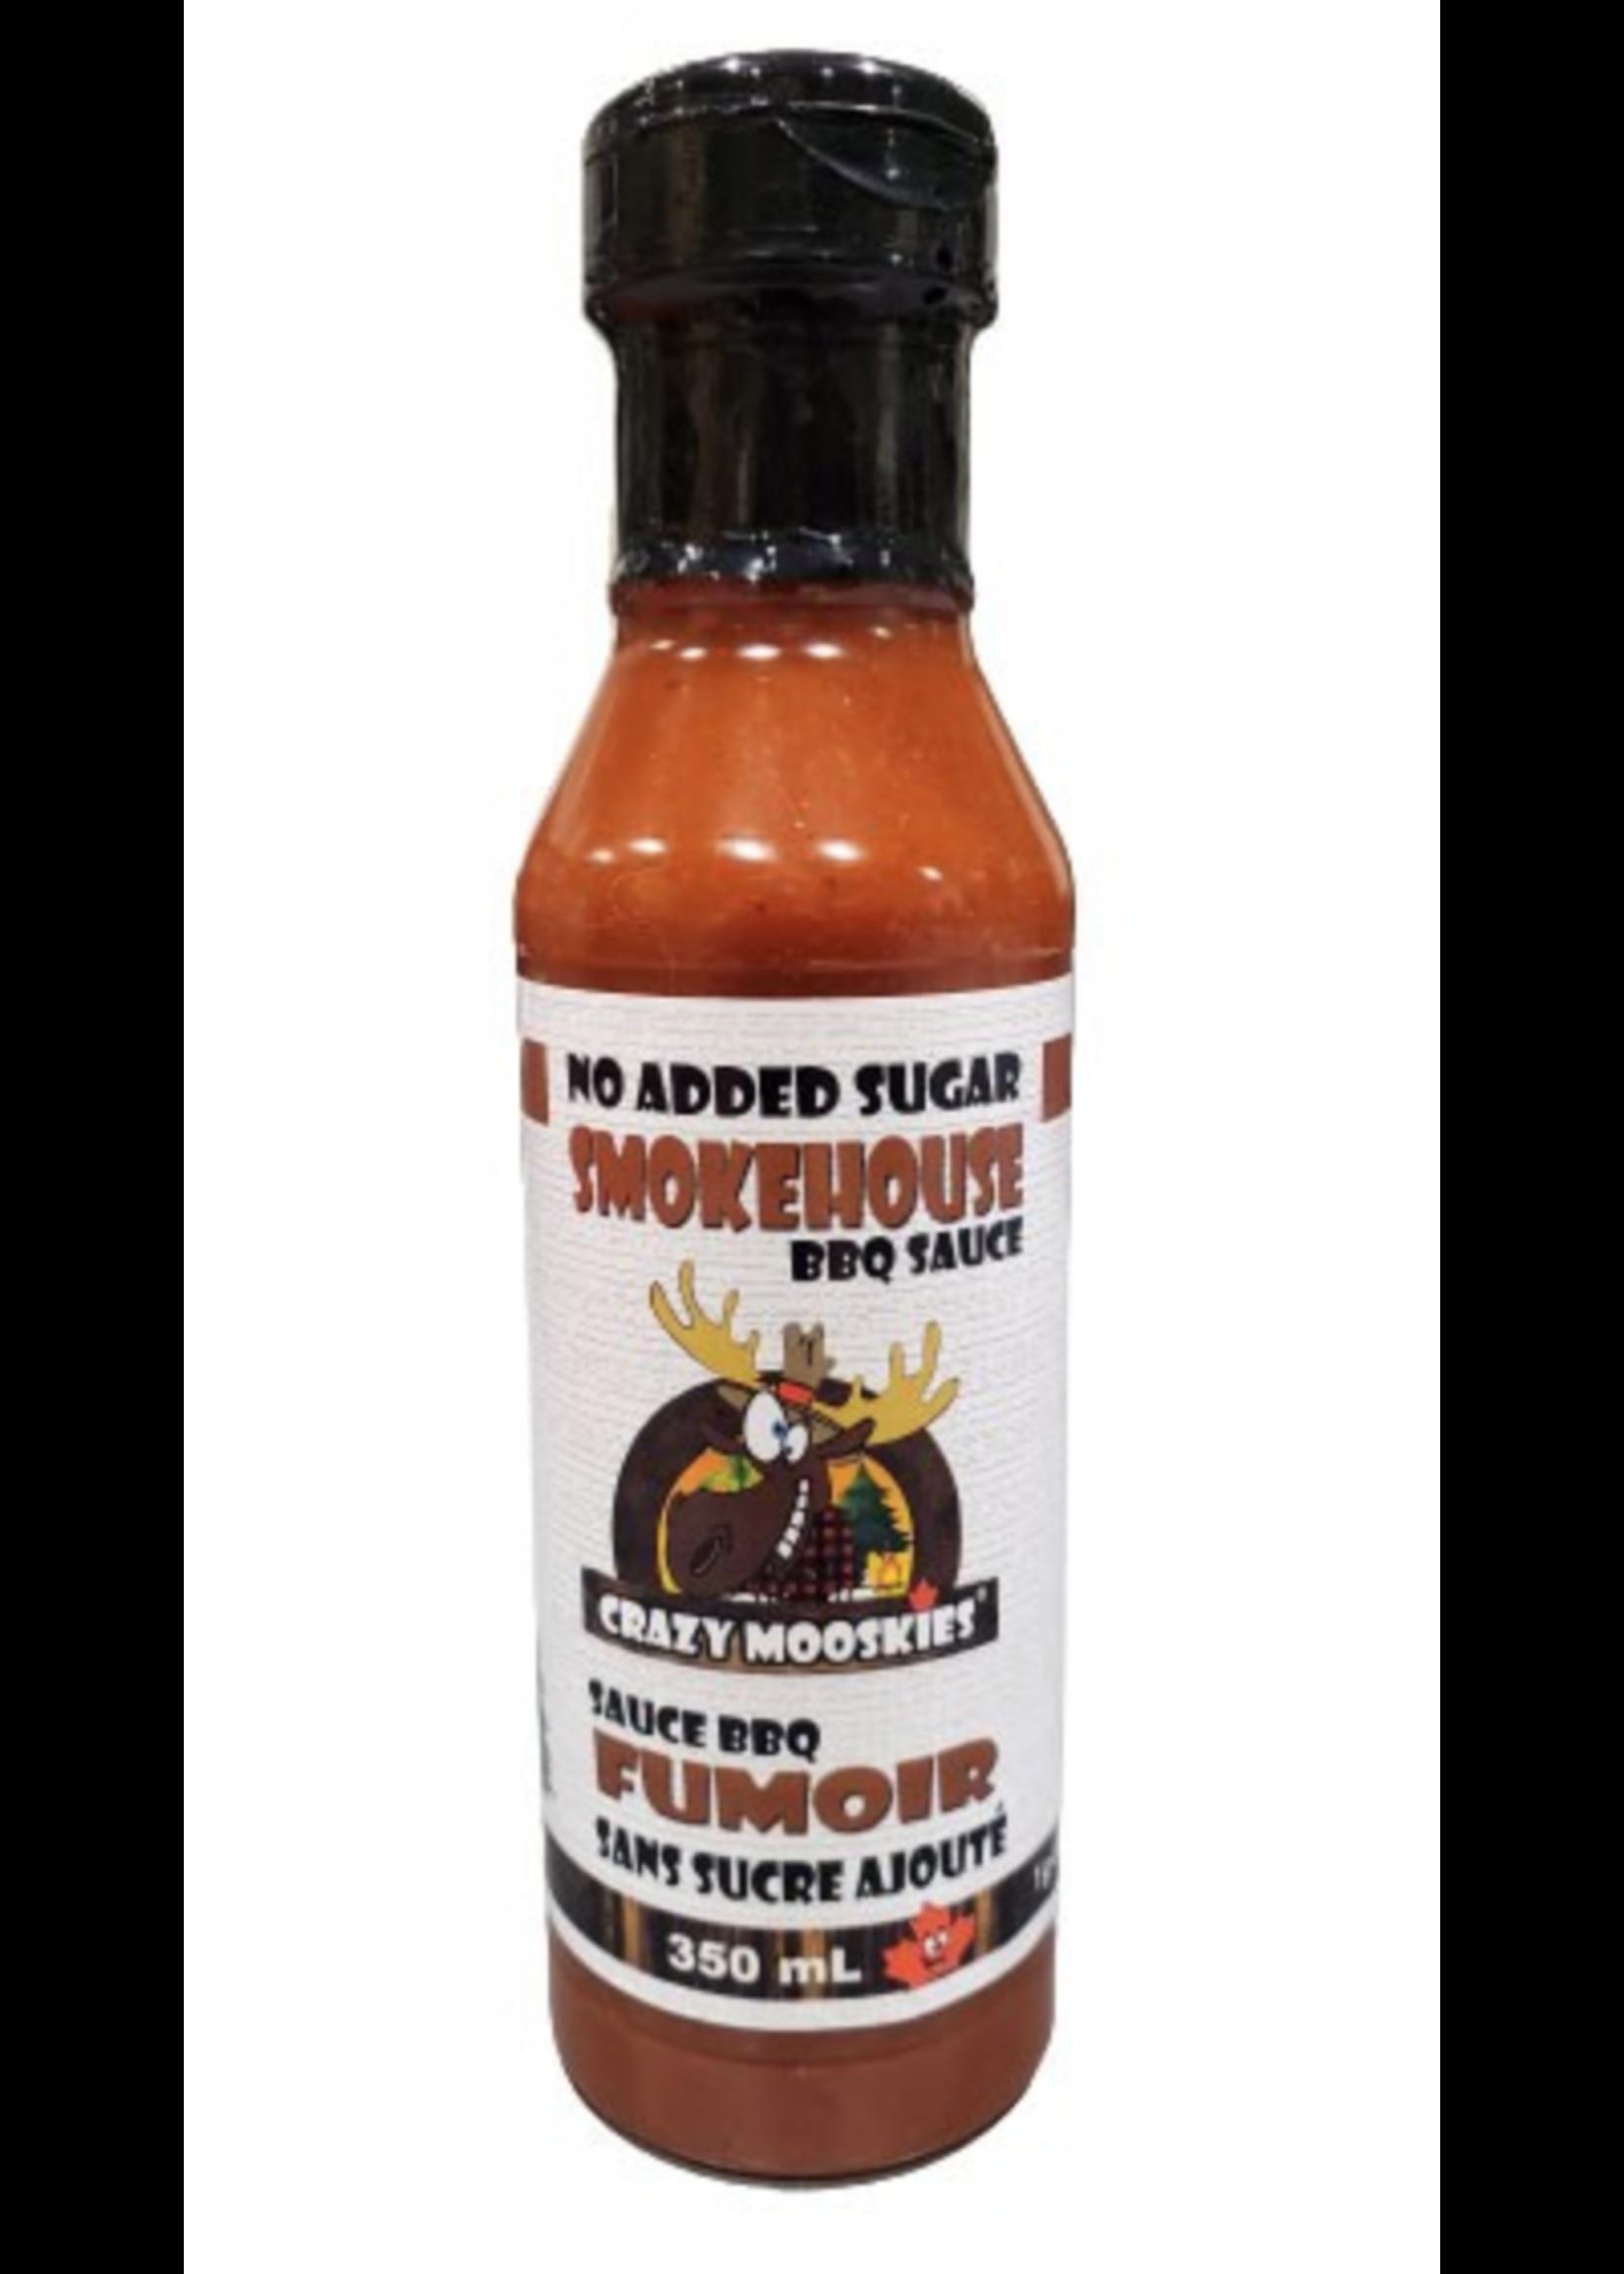 Hot Mamas Crazy Mooskies Smokehouse BBQ Sauce 350ml